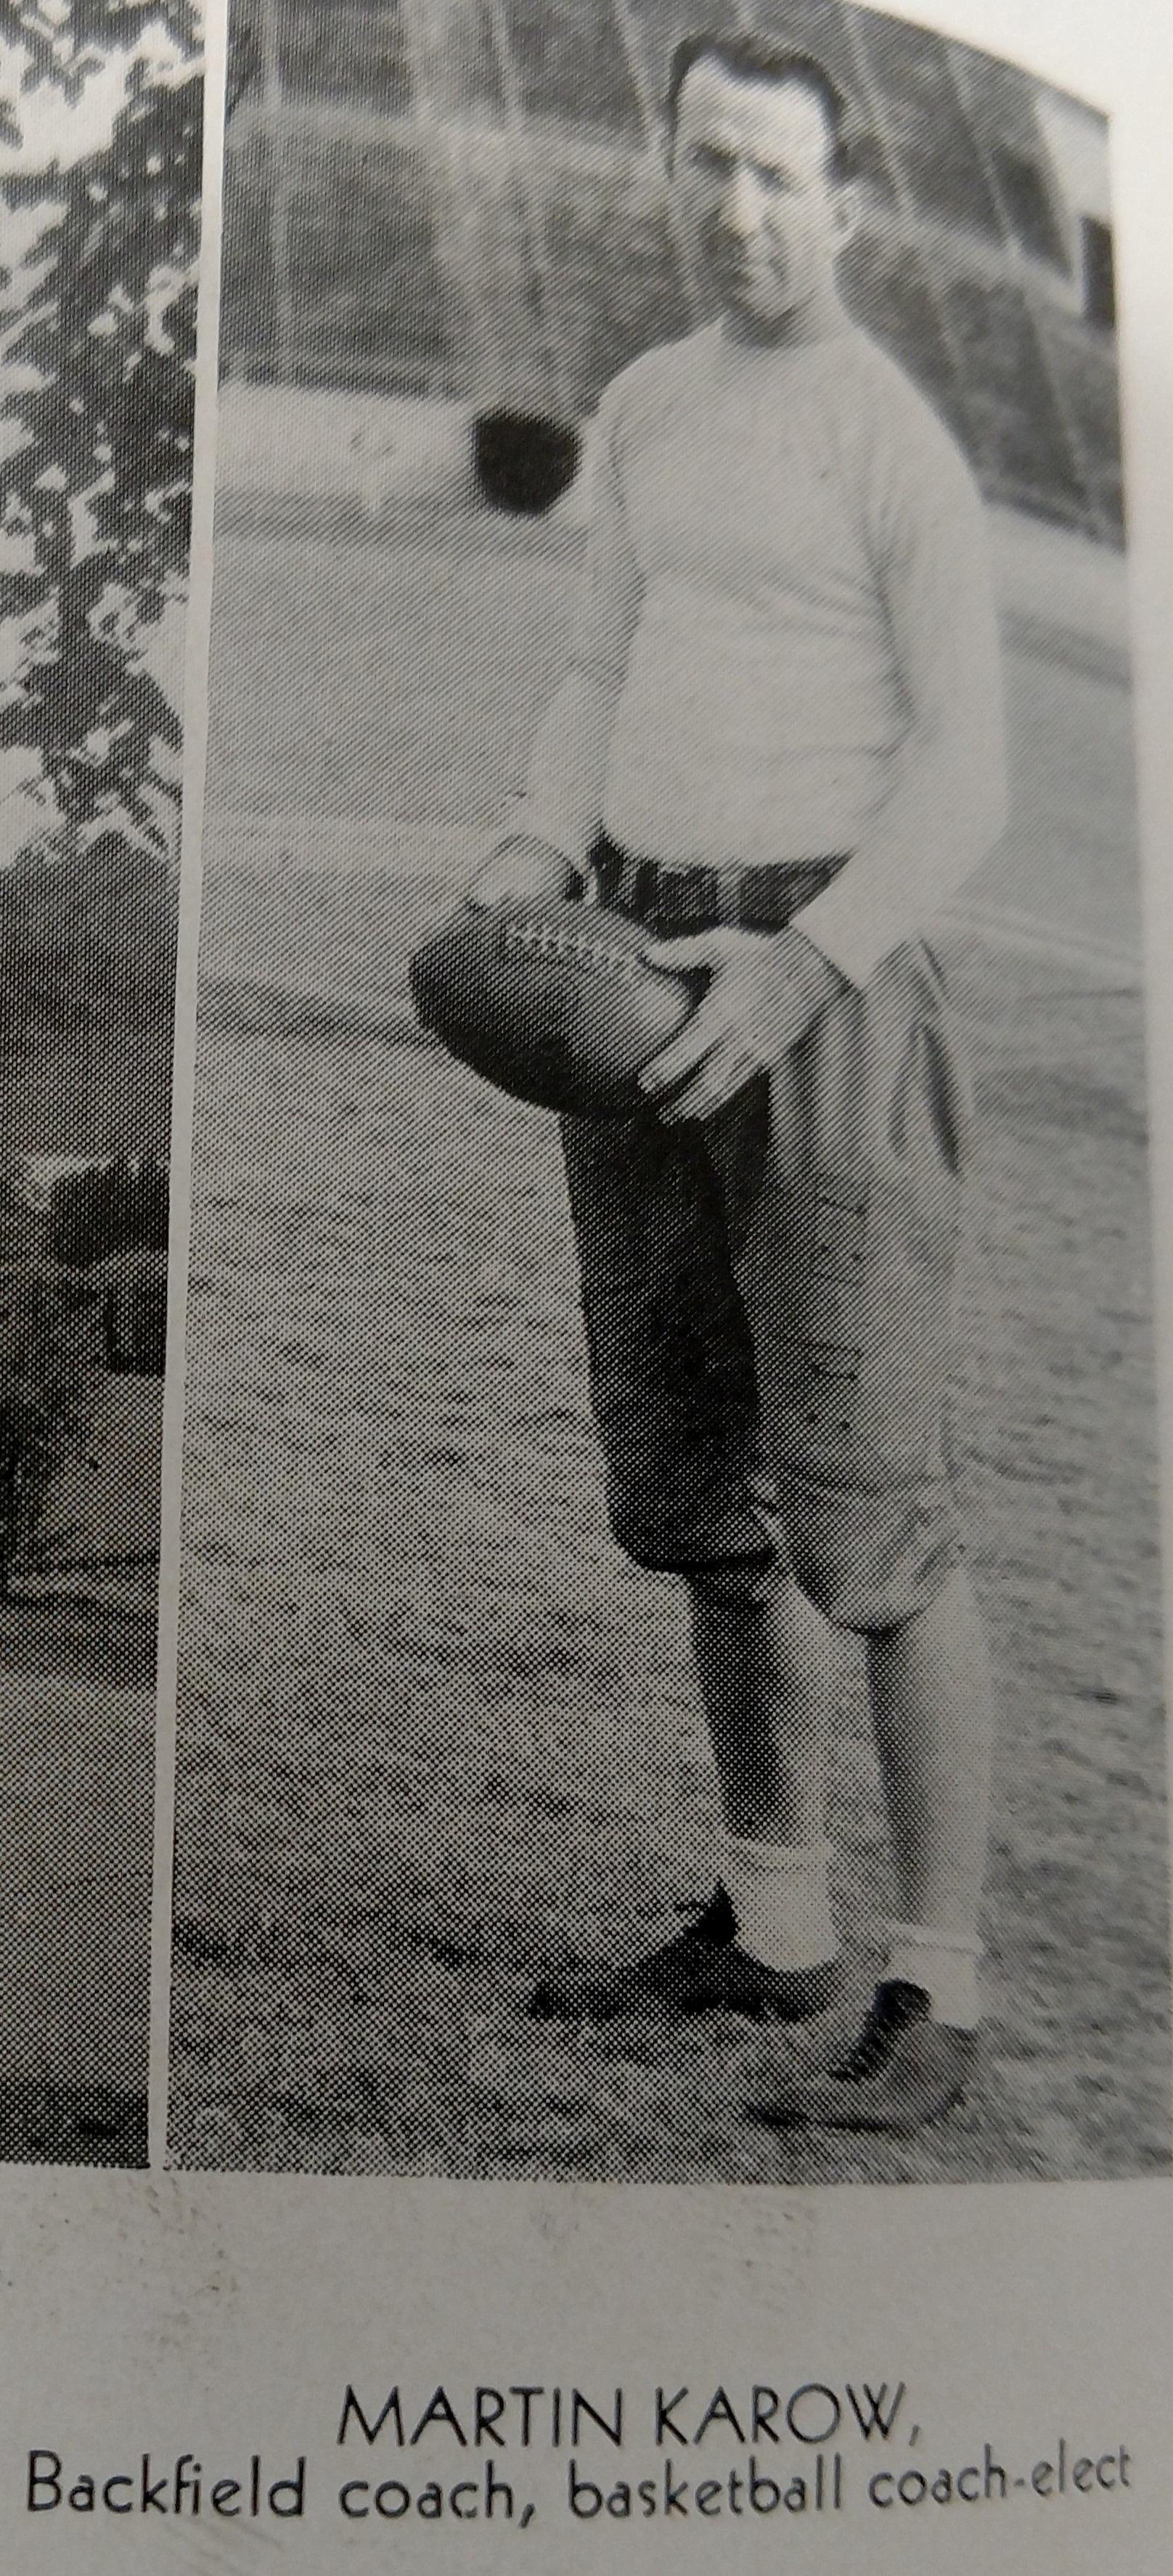 Martin Karow- asst. football coach and later head basketball coach